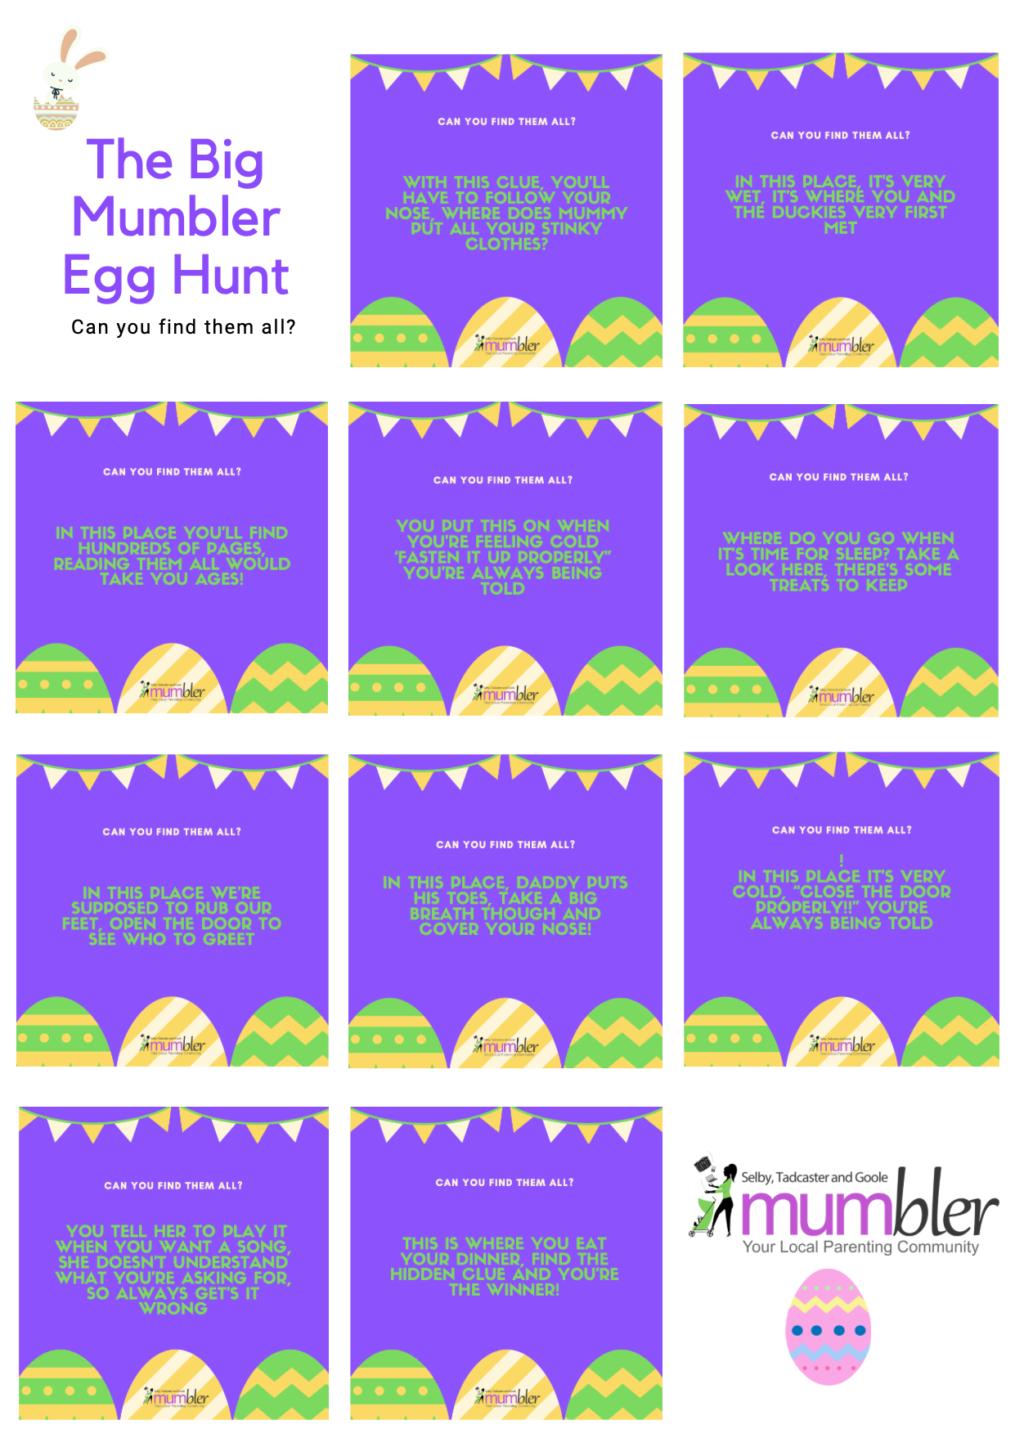 STAG Mumbler Easter egg hunt clues